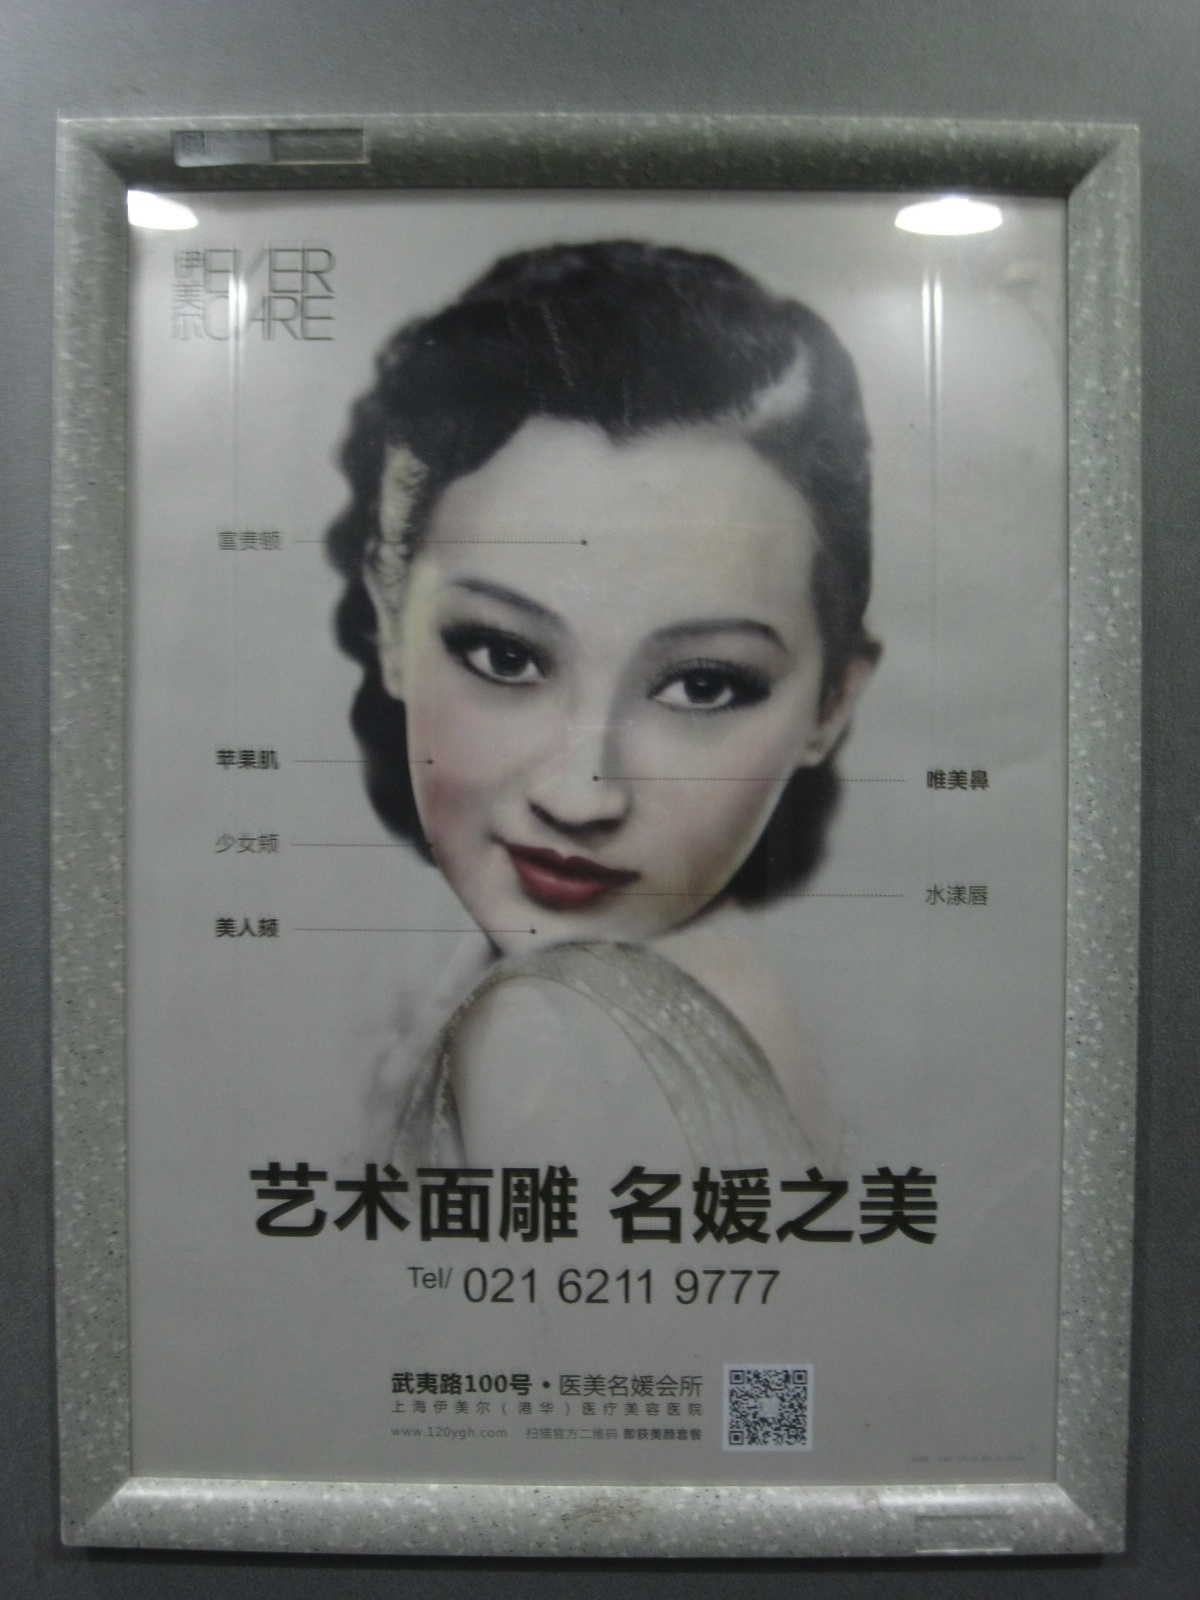 women seeking men shanghai